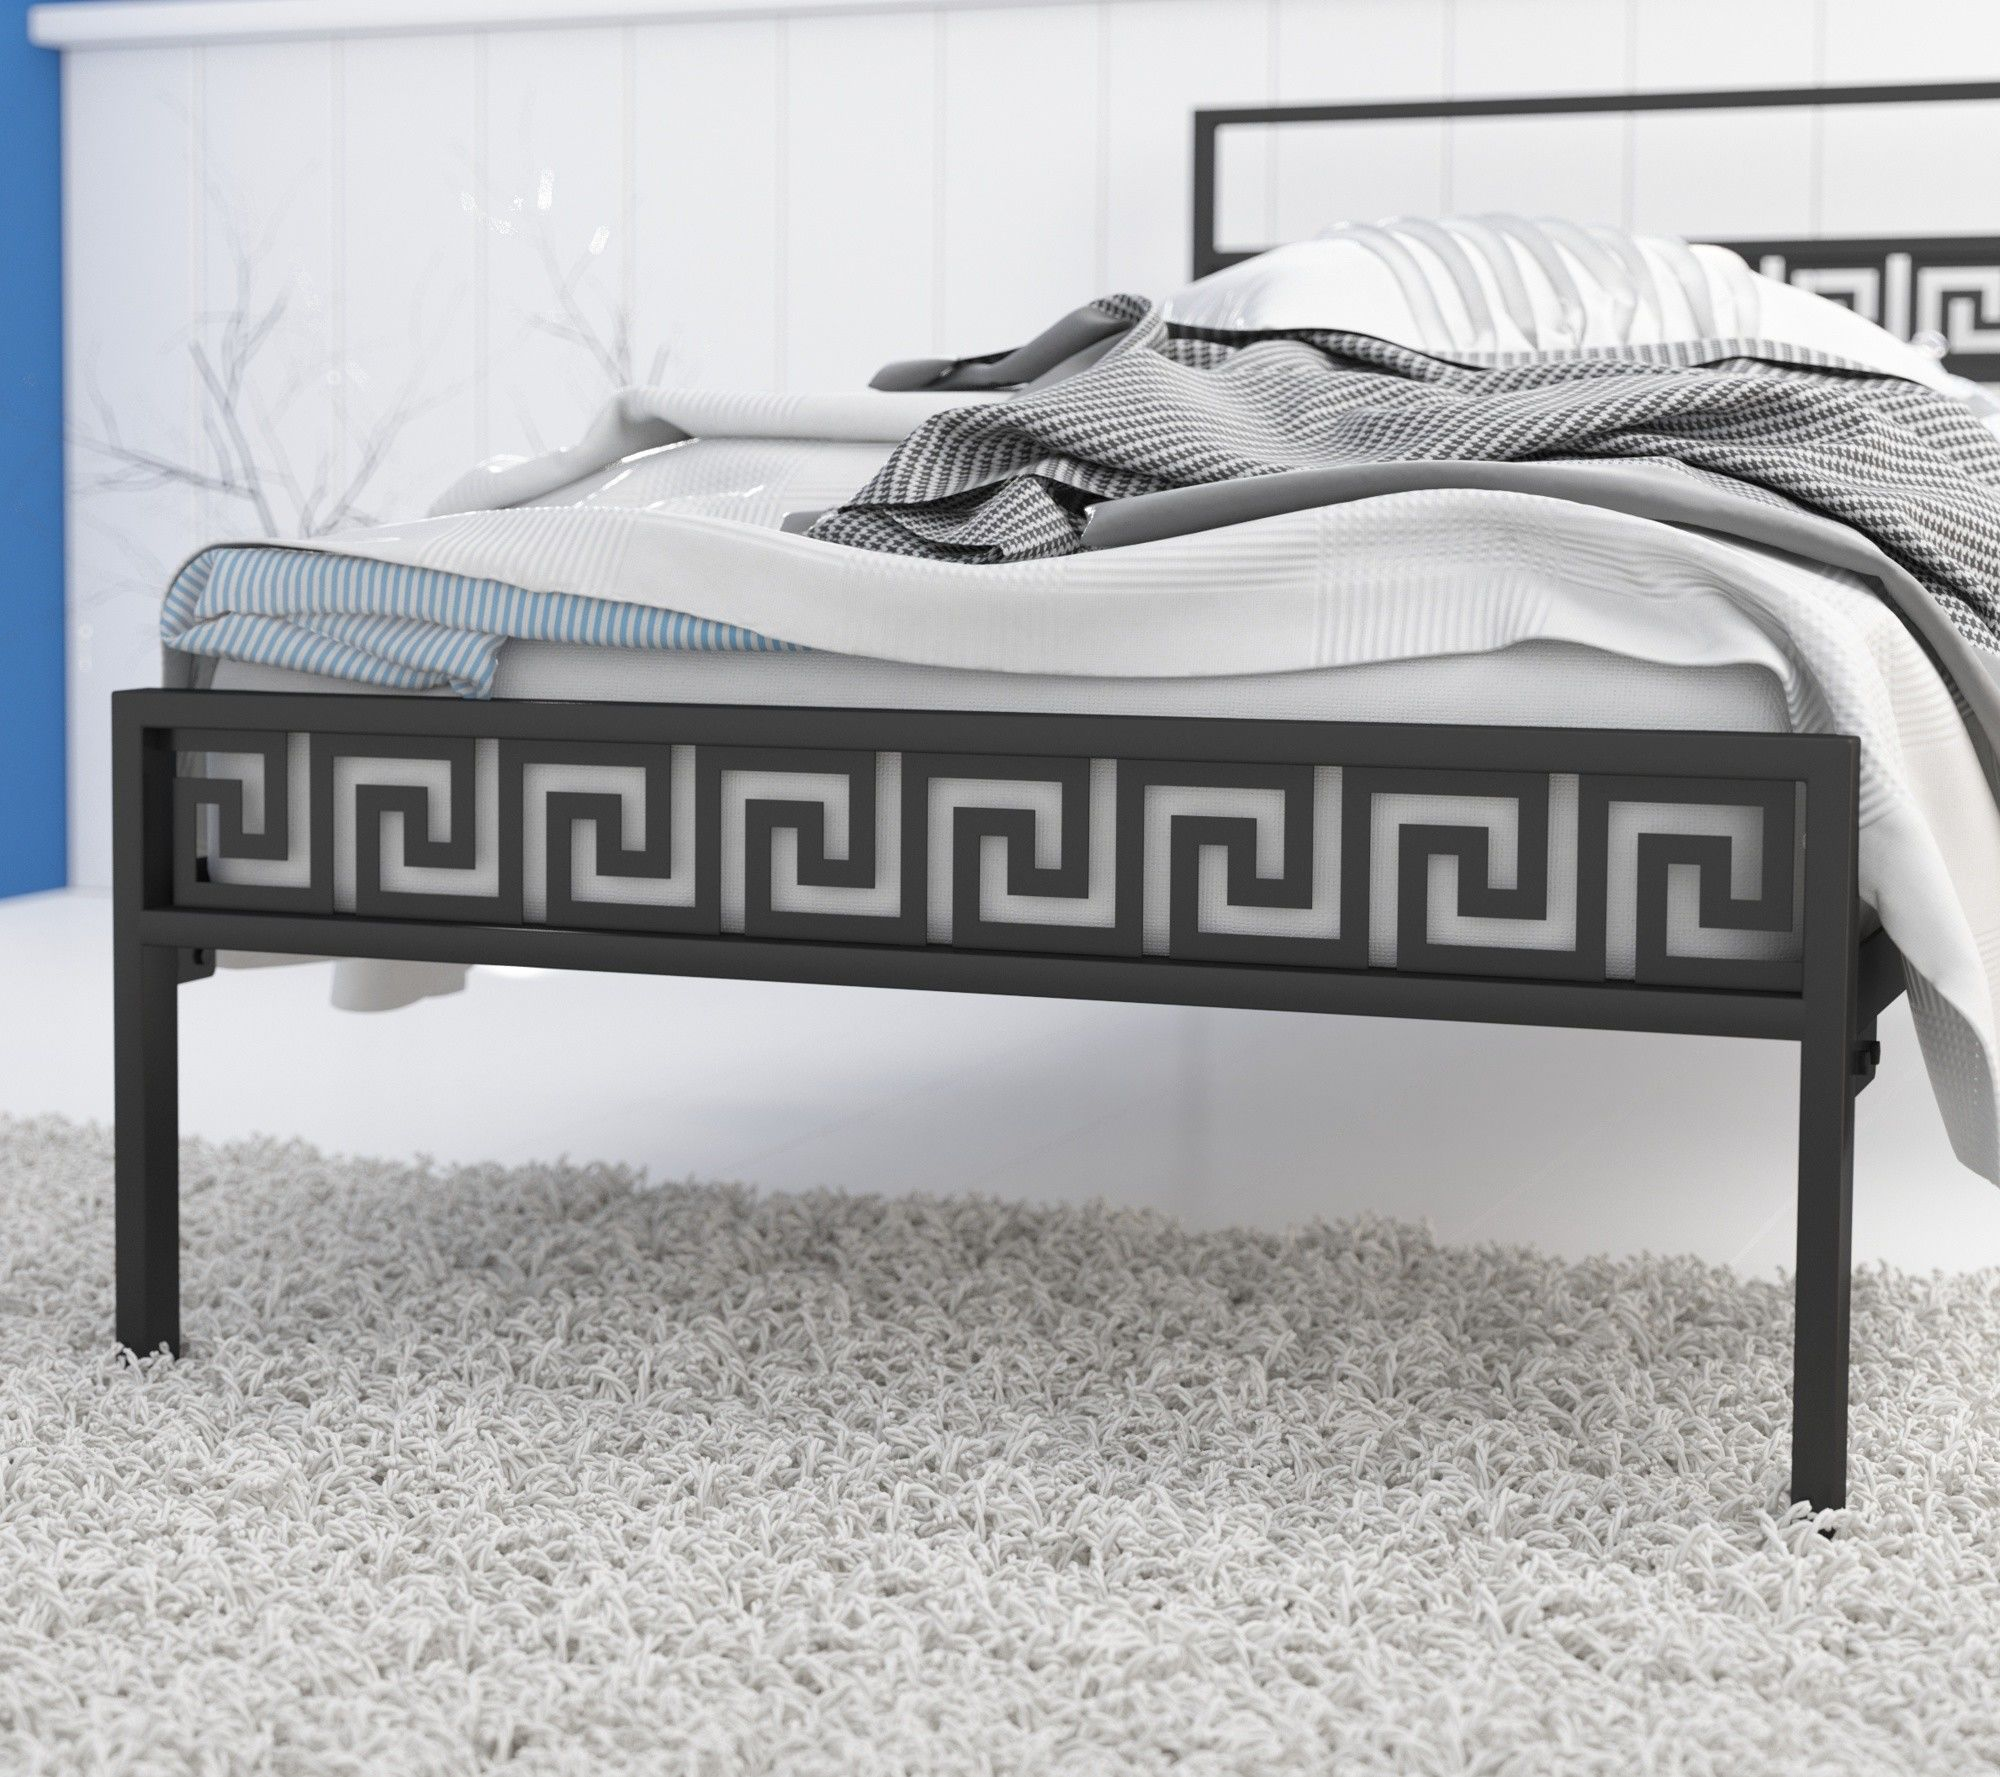 Łóżko metalowe 90x180 wzór 9 ze stelażem